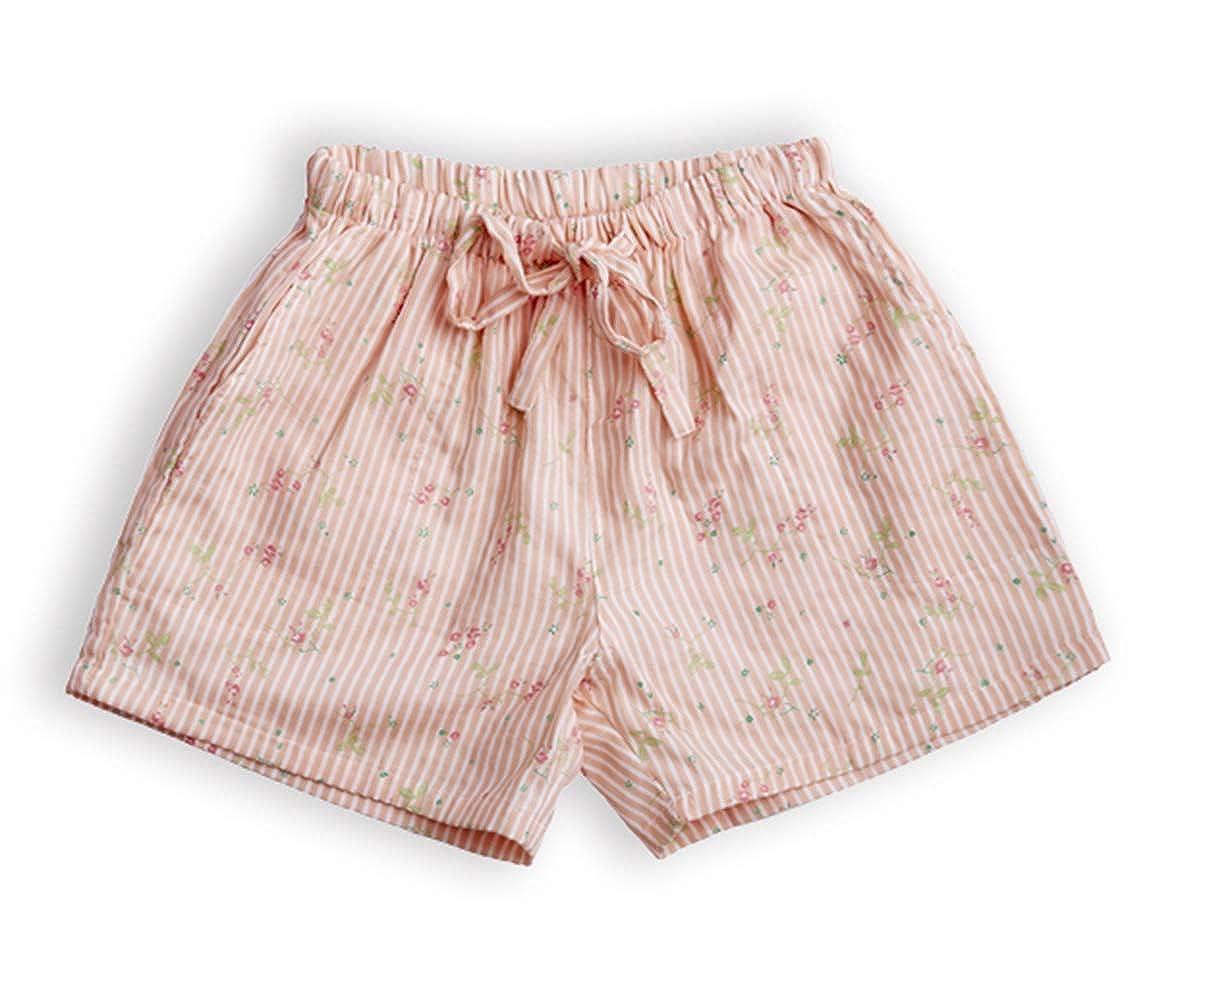 Inadays Pajama Shorts for Women Cotton Striped Shorts Women Lounge Shorts